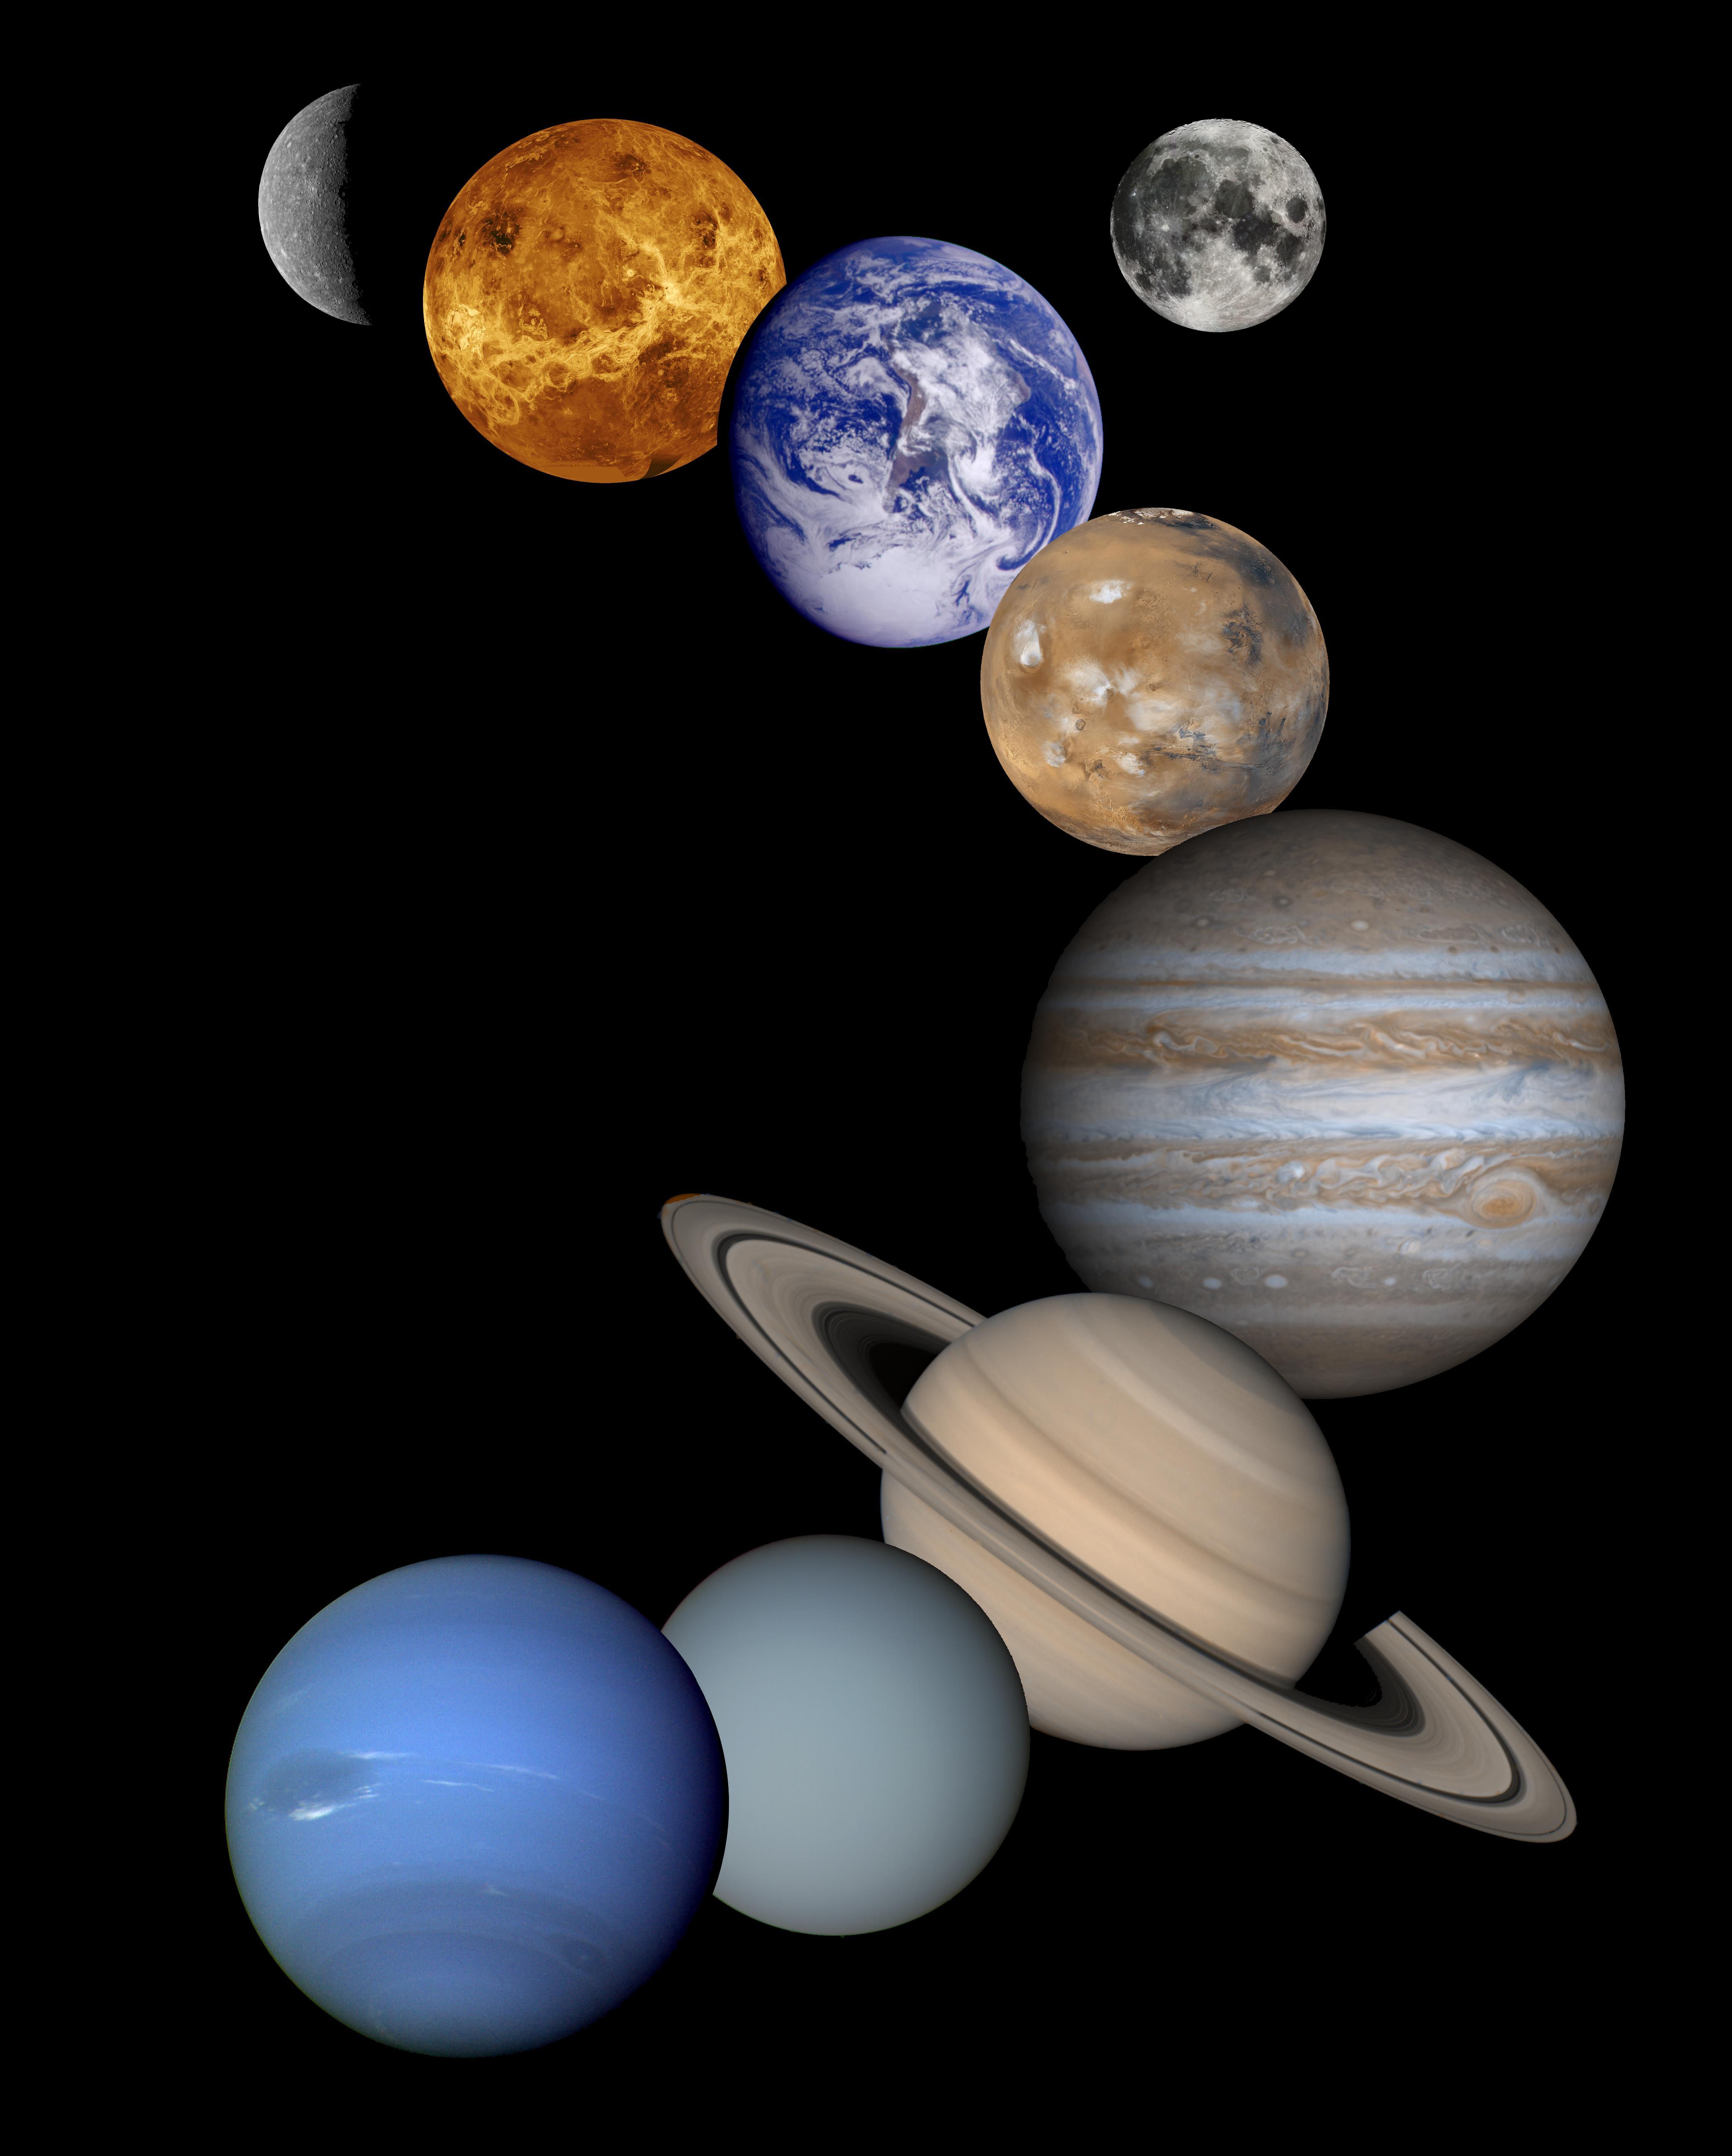 """Solar system"". Lizenziert unter Public domain über Wikimedia Commons"